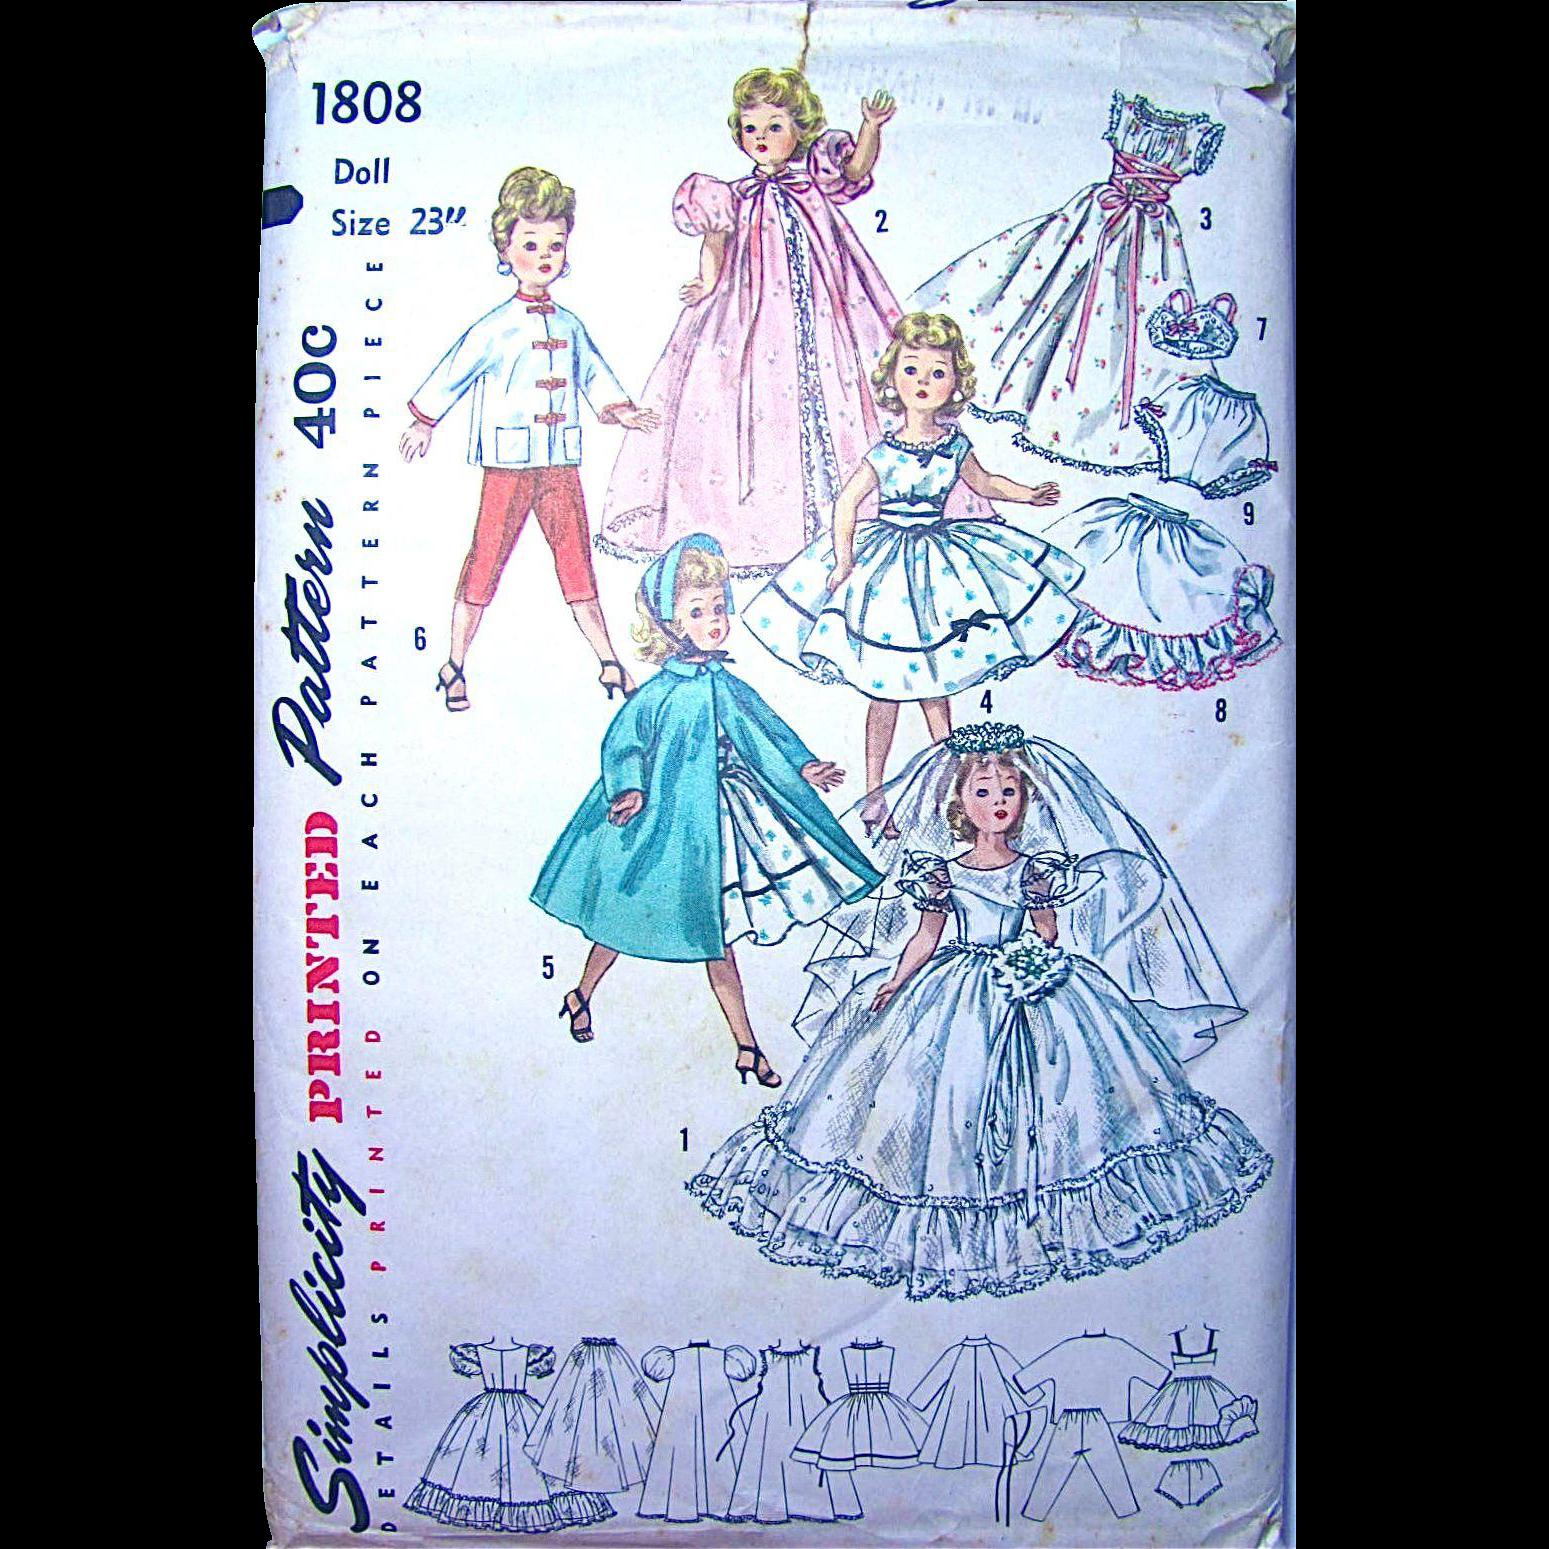 Revlon, Cissy Doll Bridal Pattern, Simplicity 1808, Size 23 Inches, Vintage 1950s, Complete